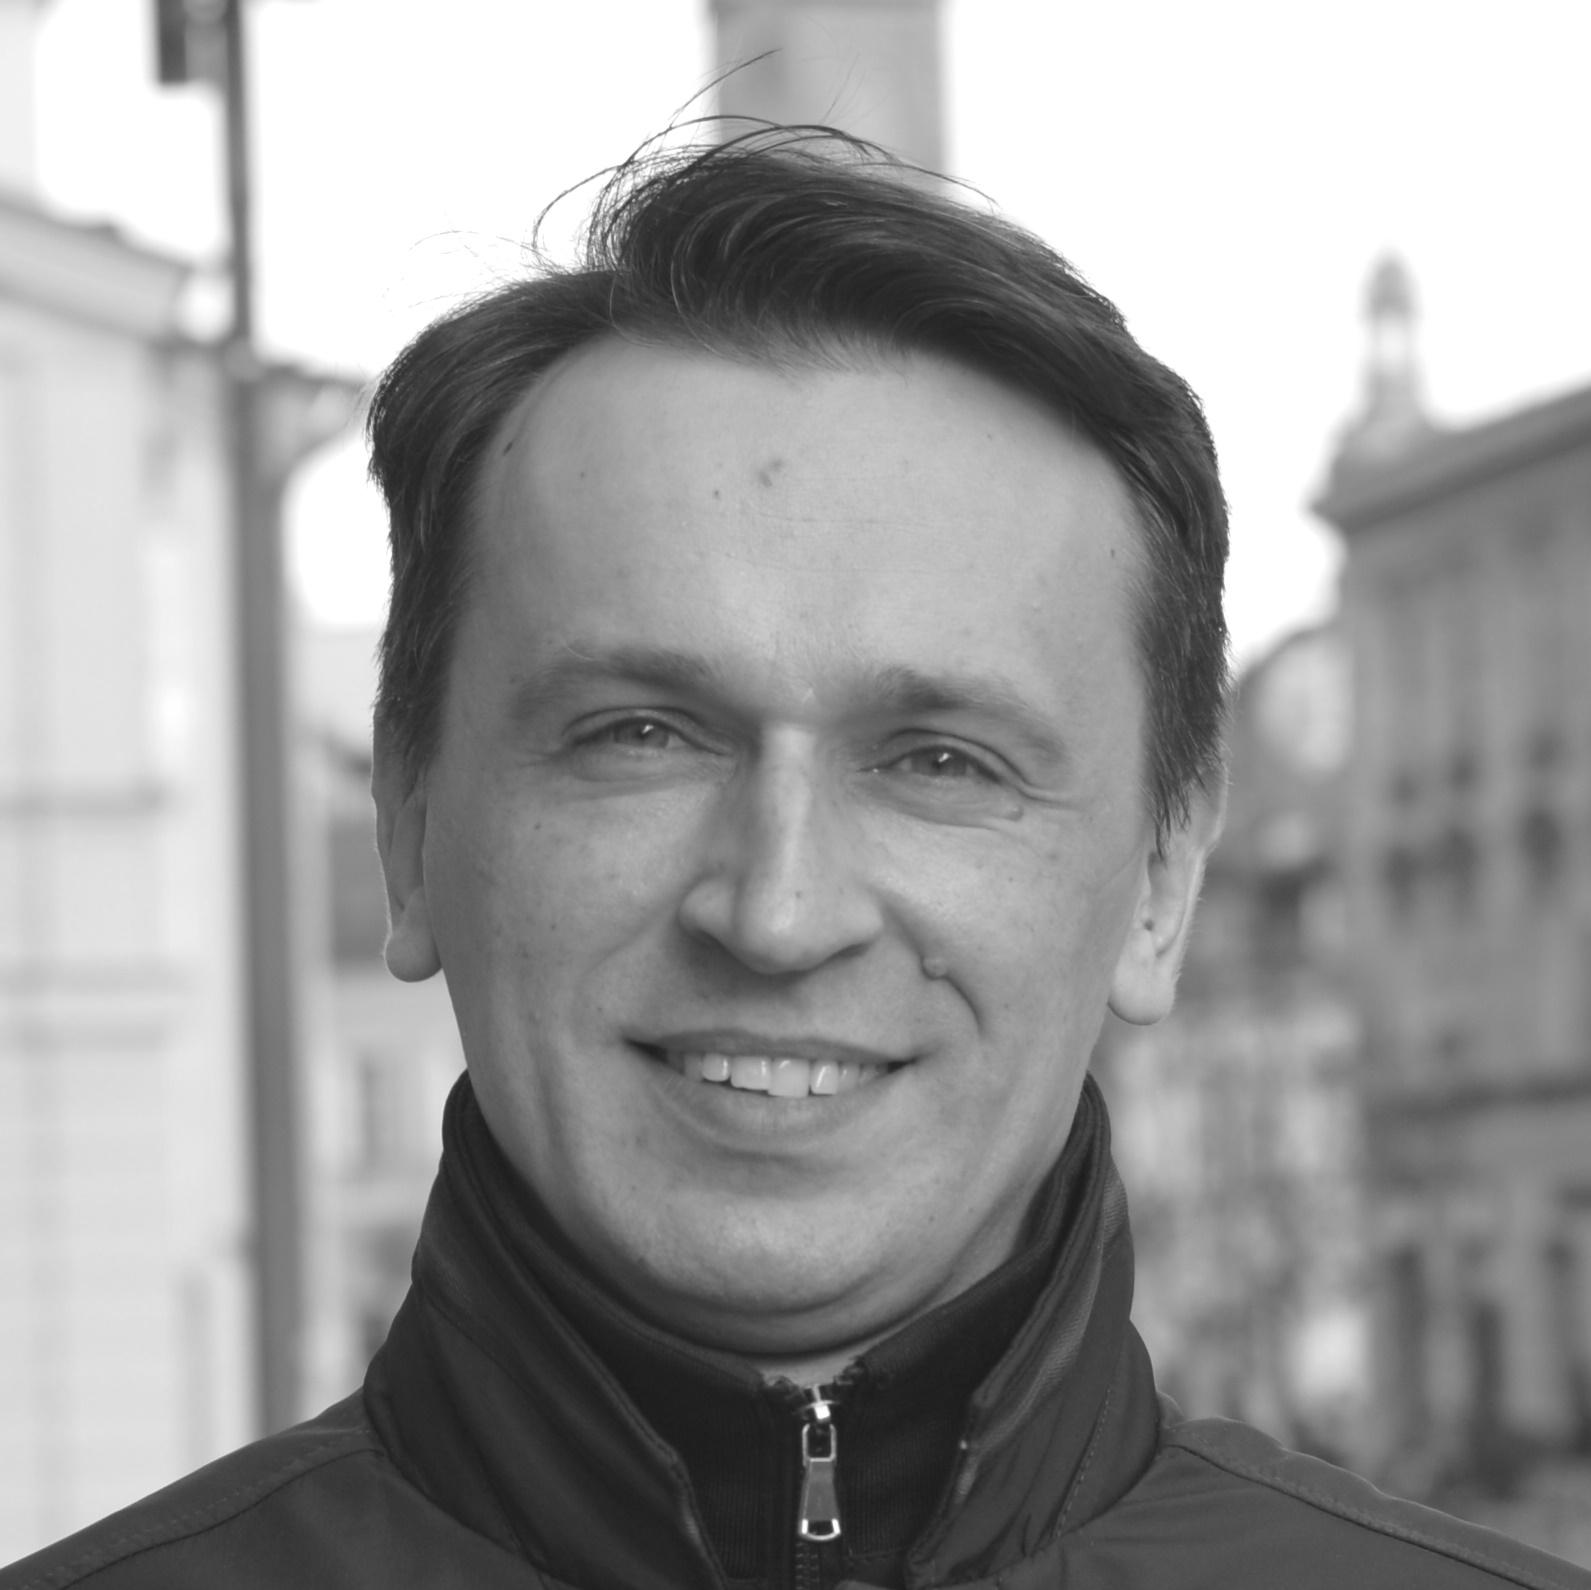 Jakub Bis